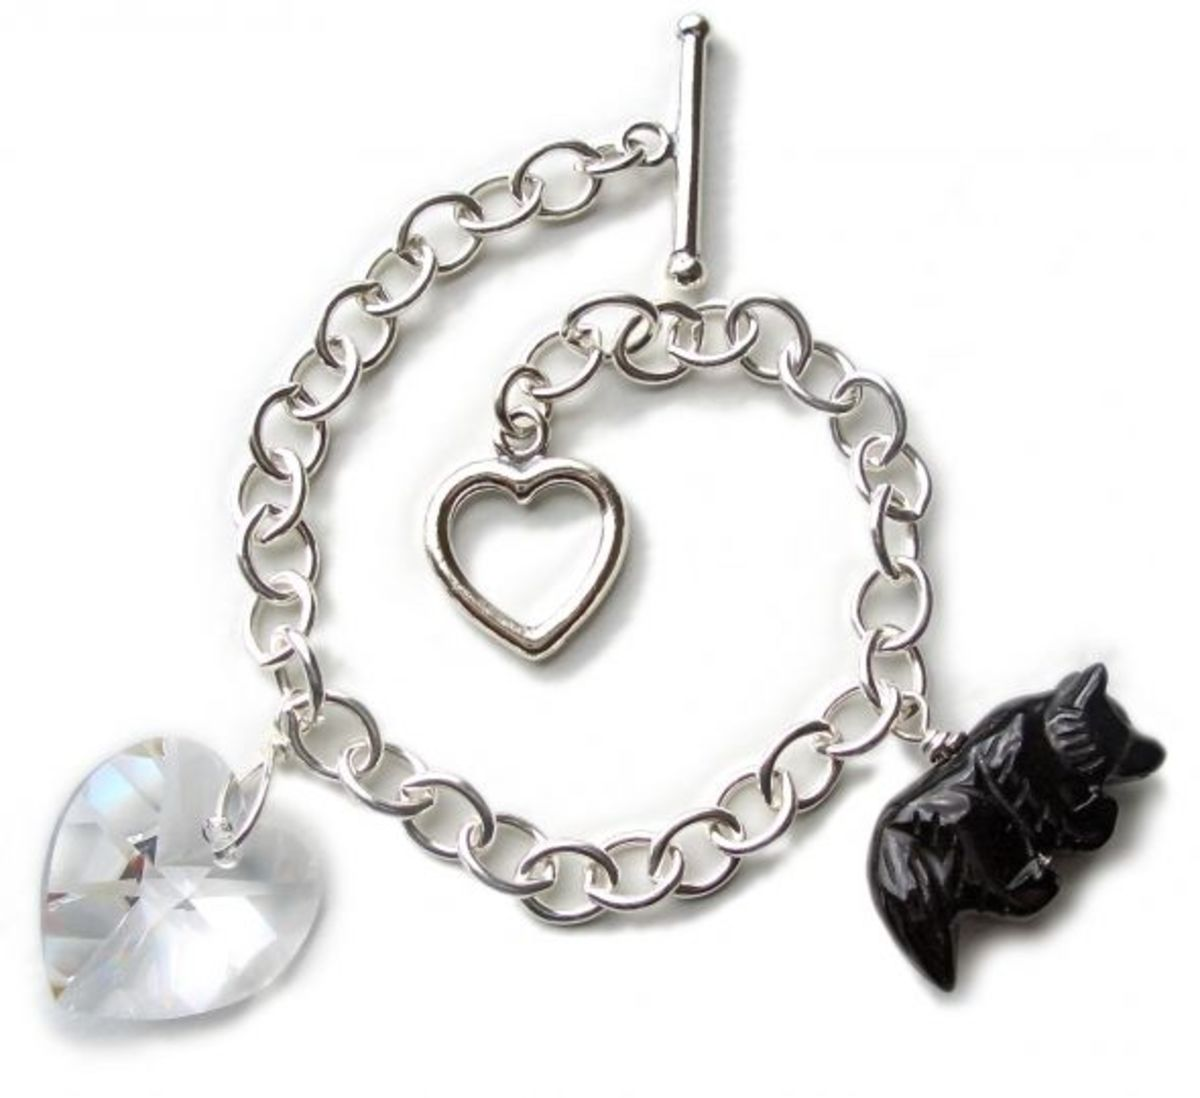 Bella's Bracelet from Eclipse